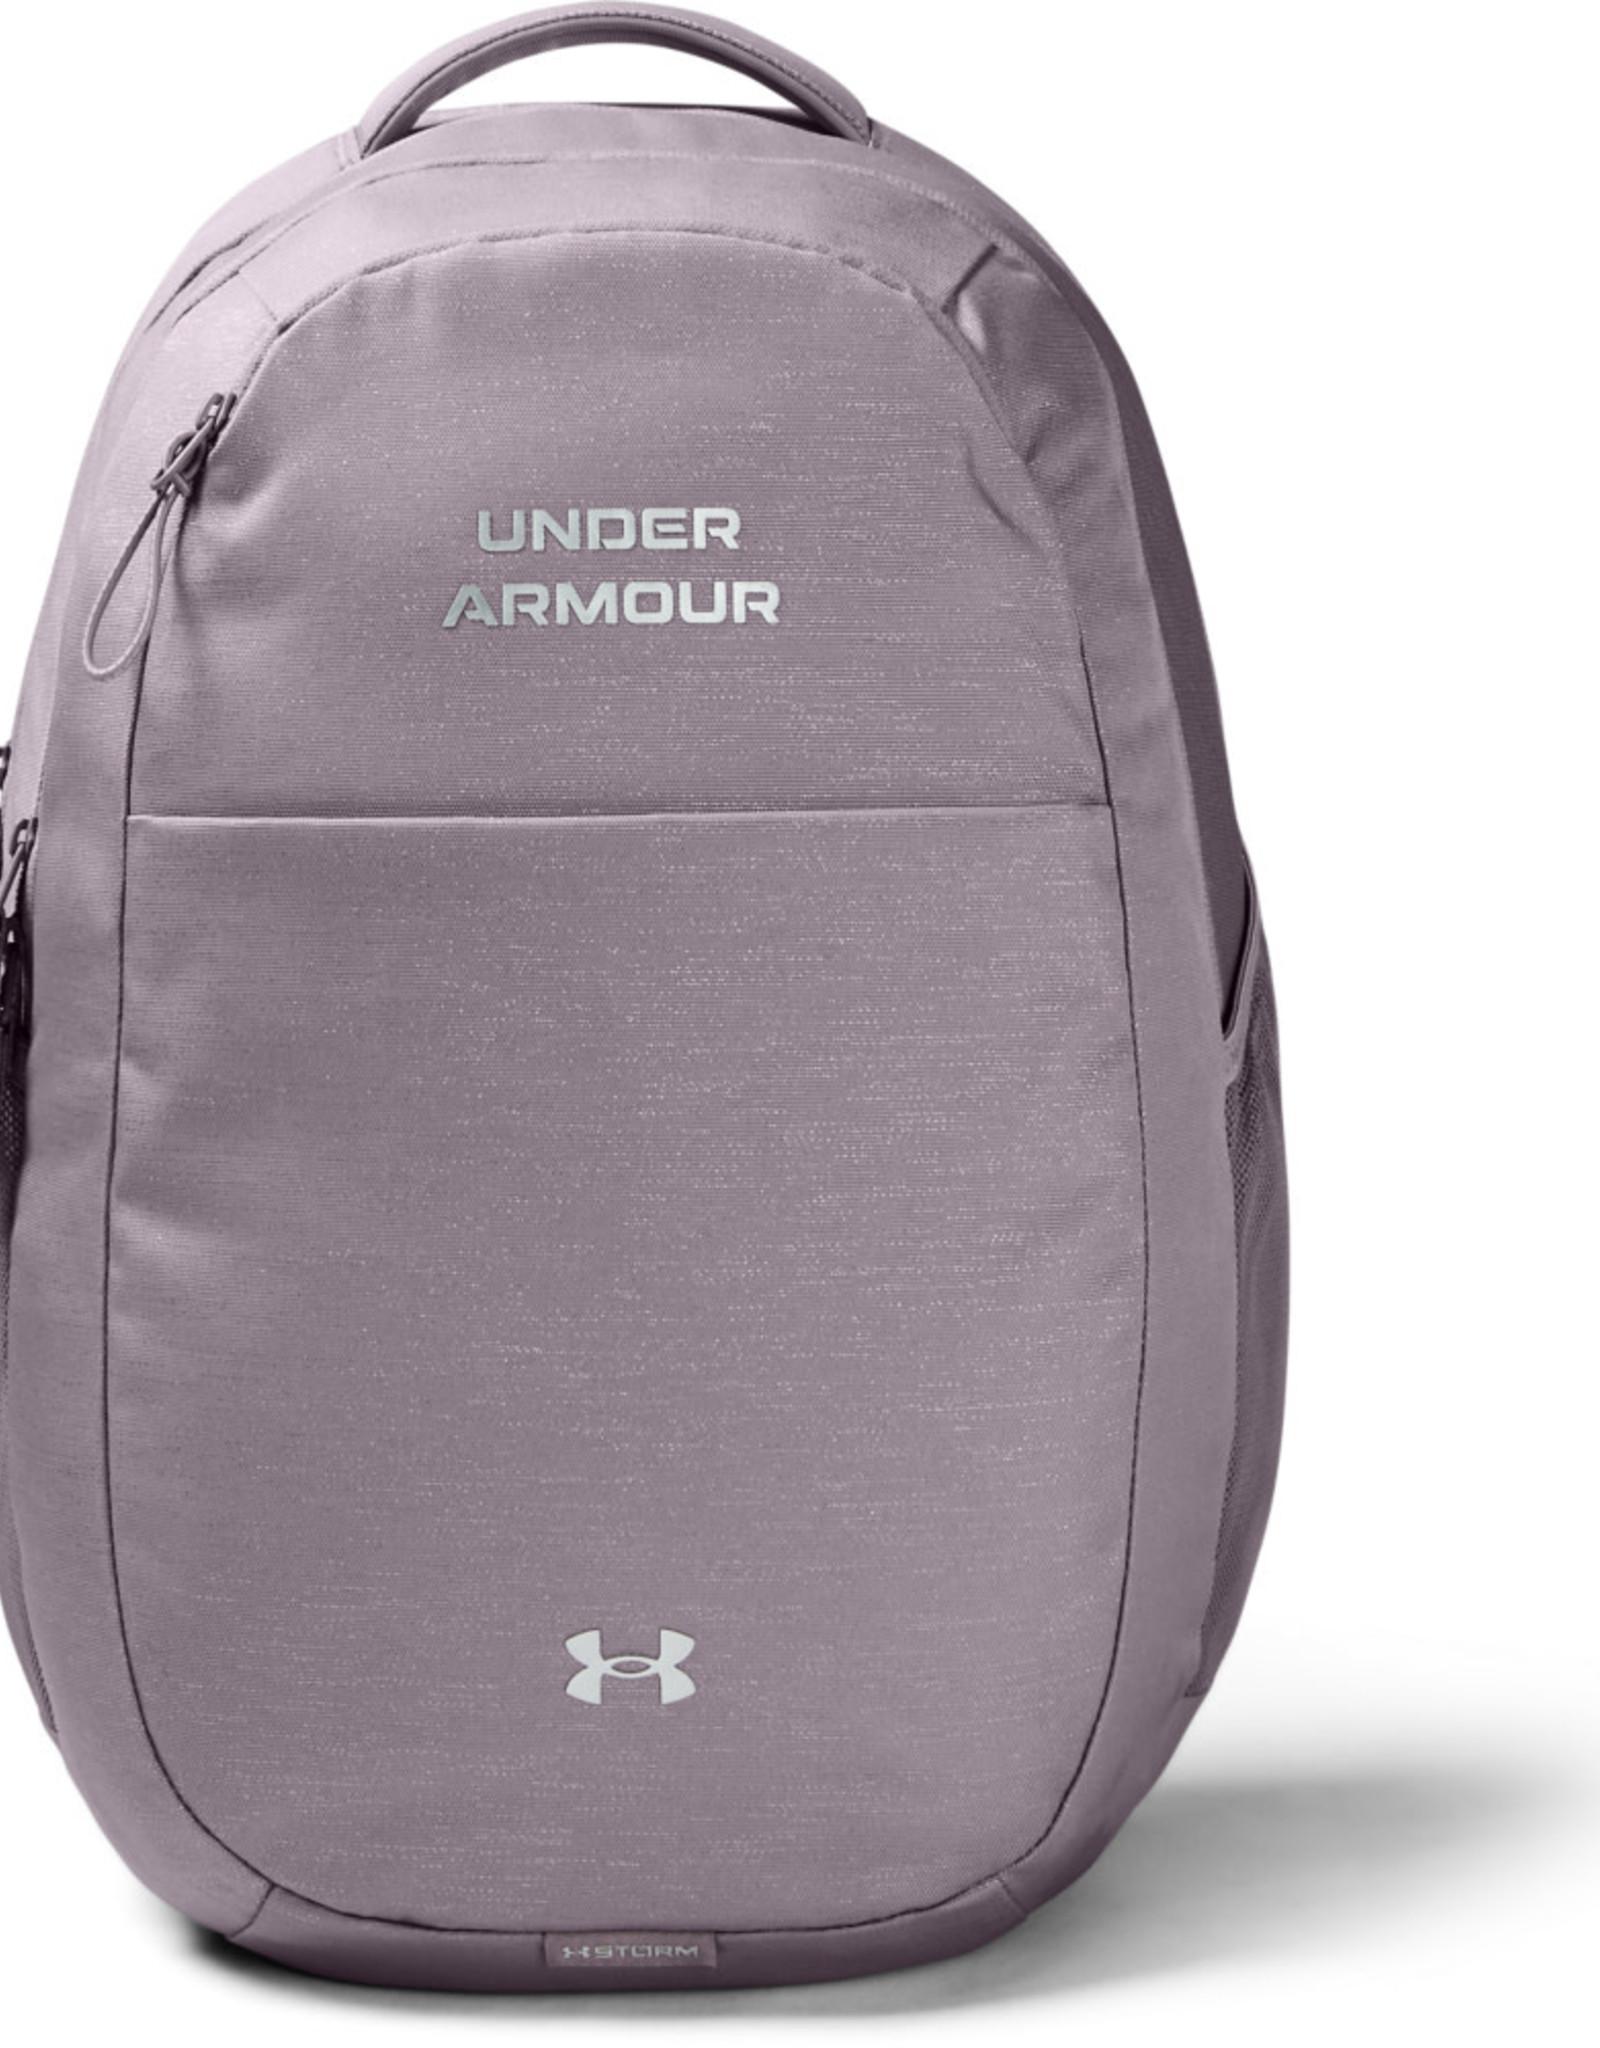 Under Armour UA Hustle Signature Backpack - Slate Purple-Slate Purple-Metallic Silver - OSFA